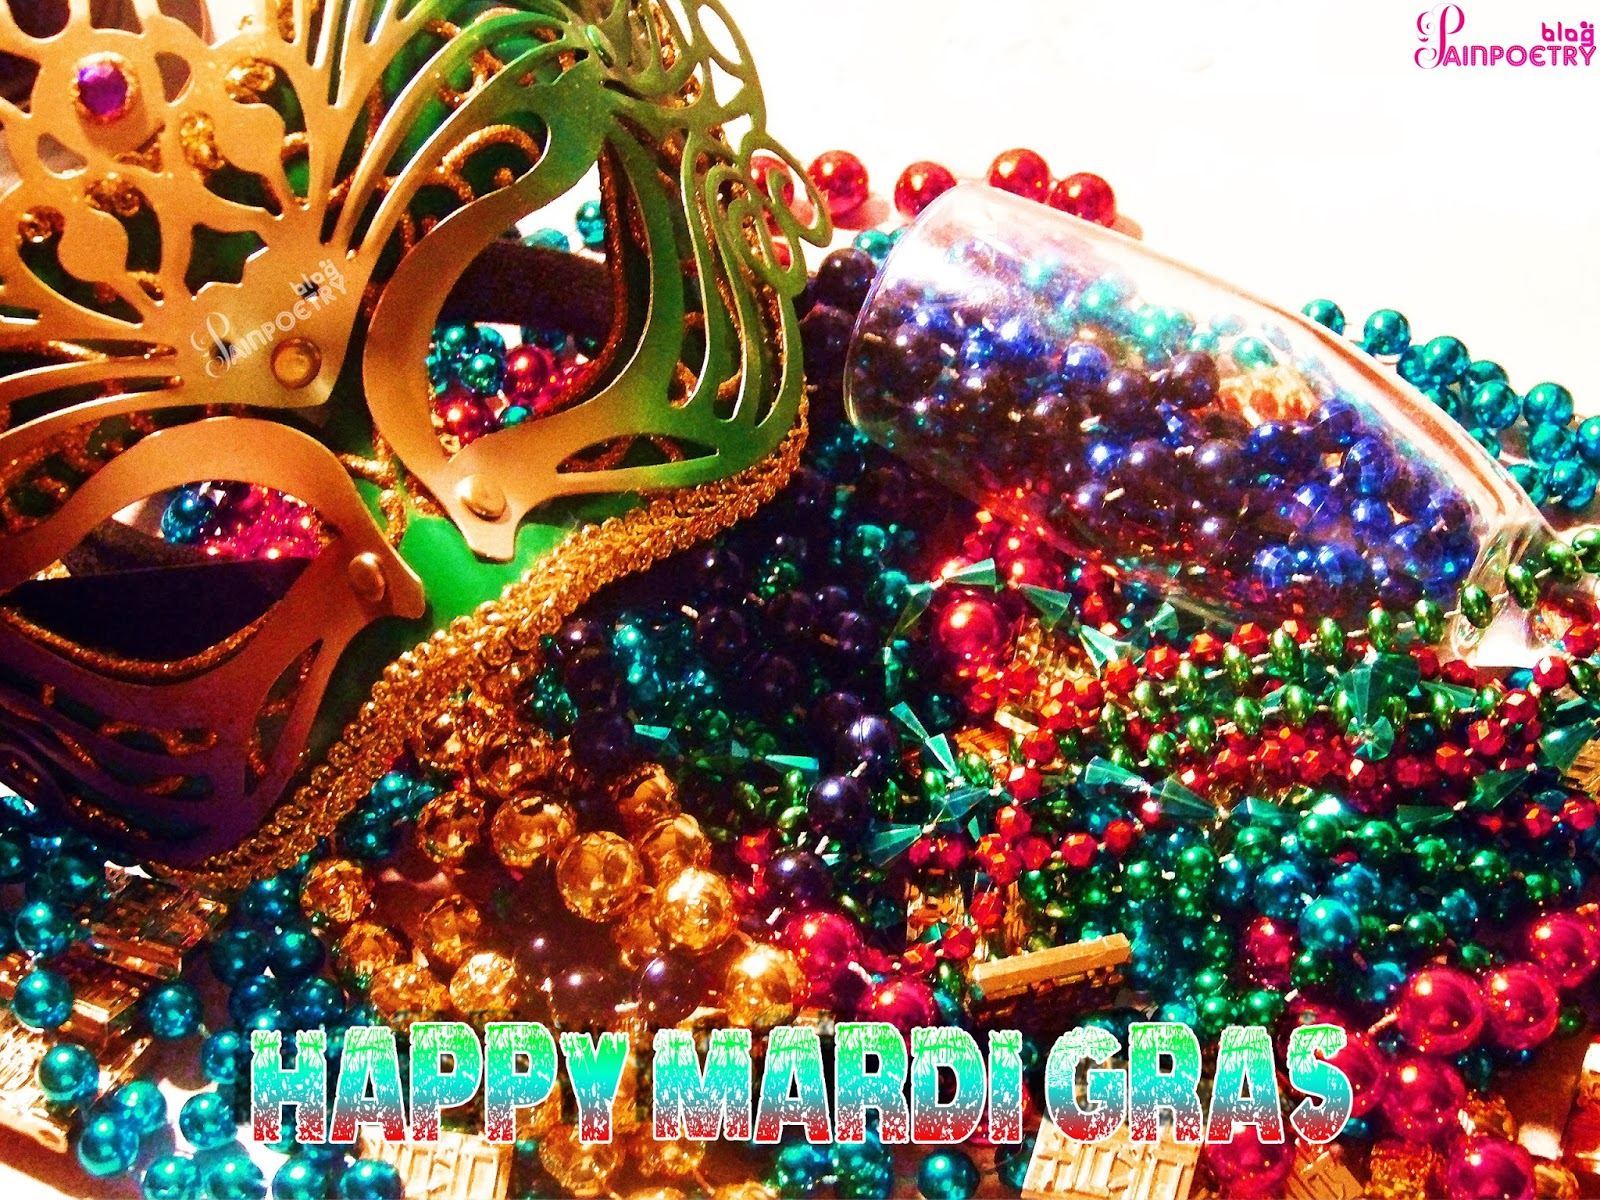 Happy-Mardi-Gras-Mask-Image-HD